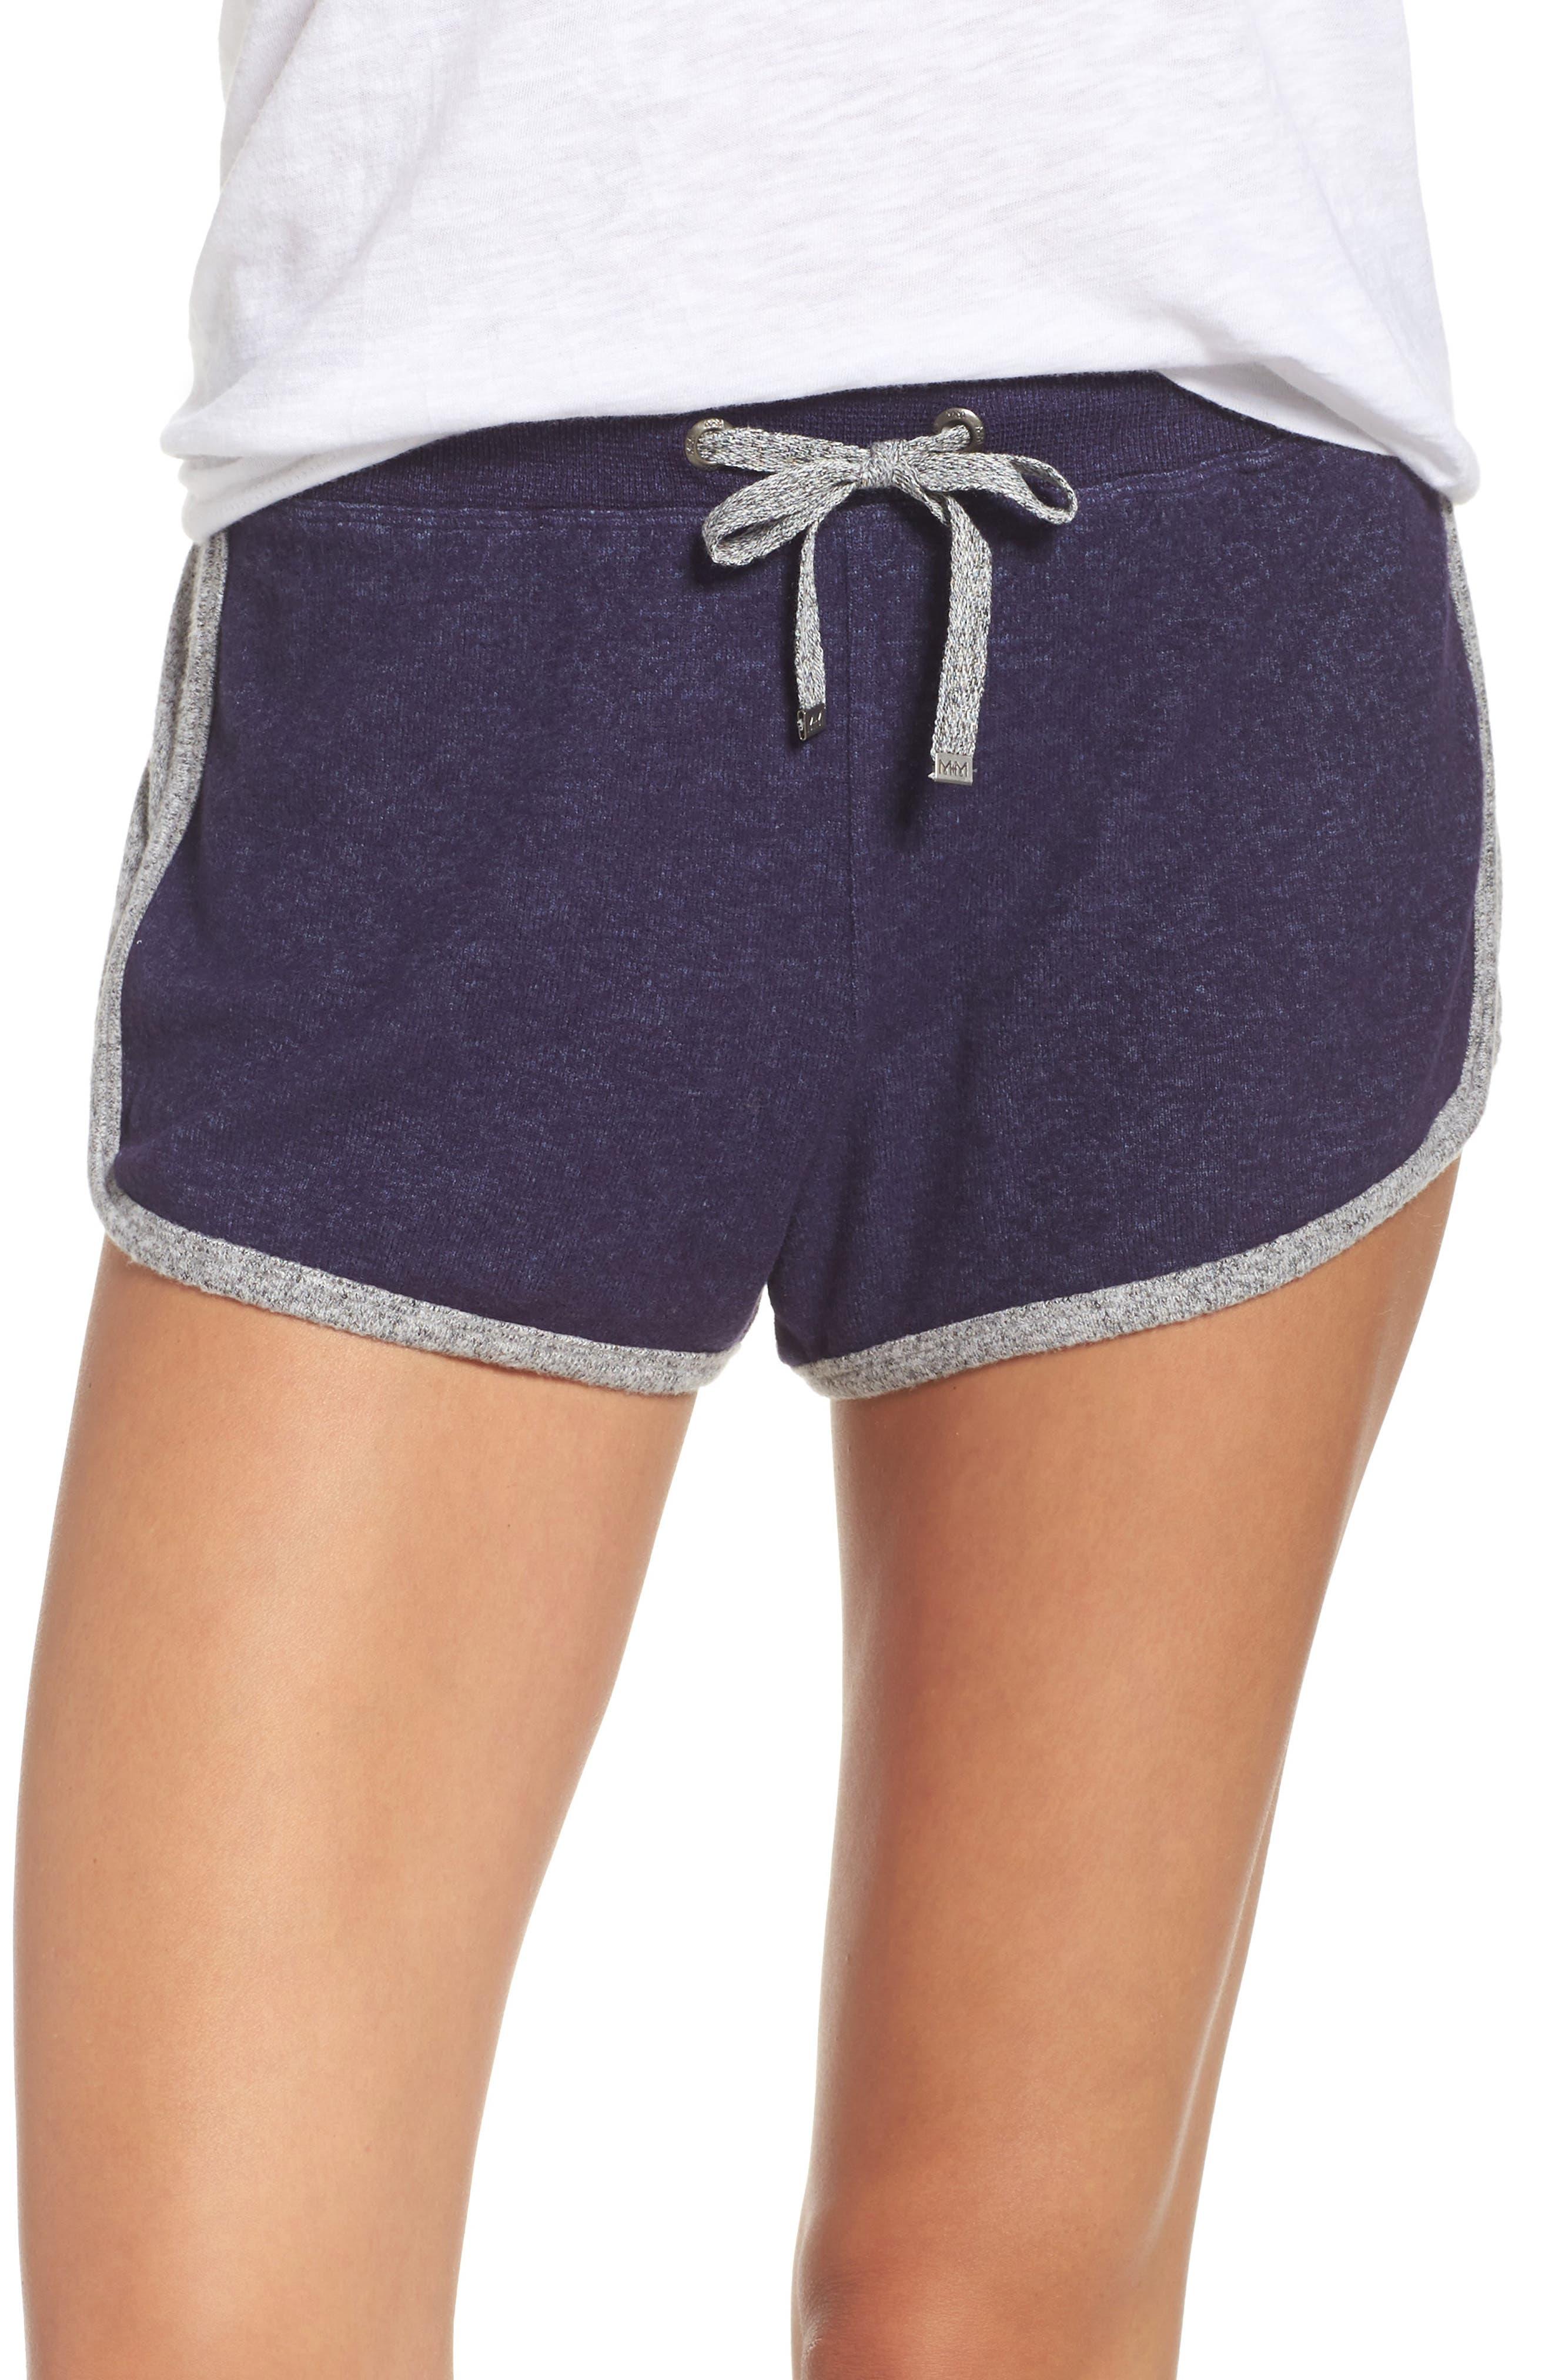 Alternate Image 1 Selected - Make + Model Bring It On Lounge Shorts